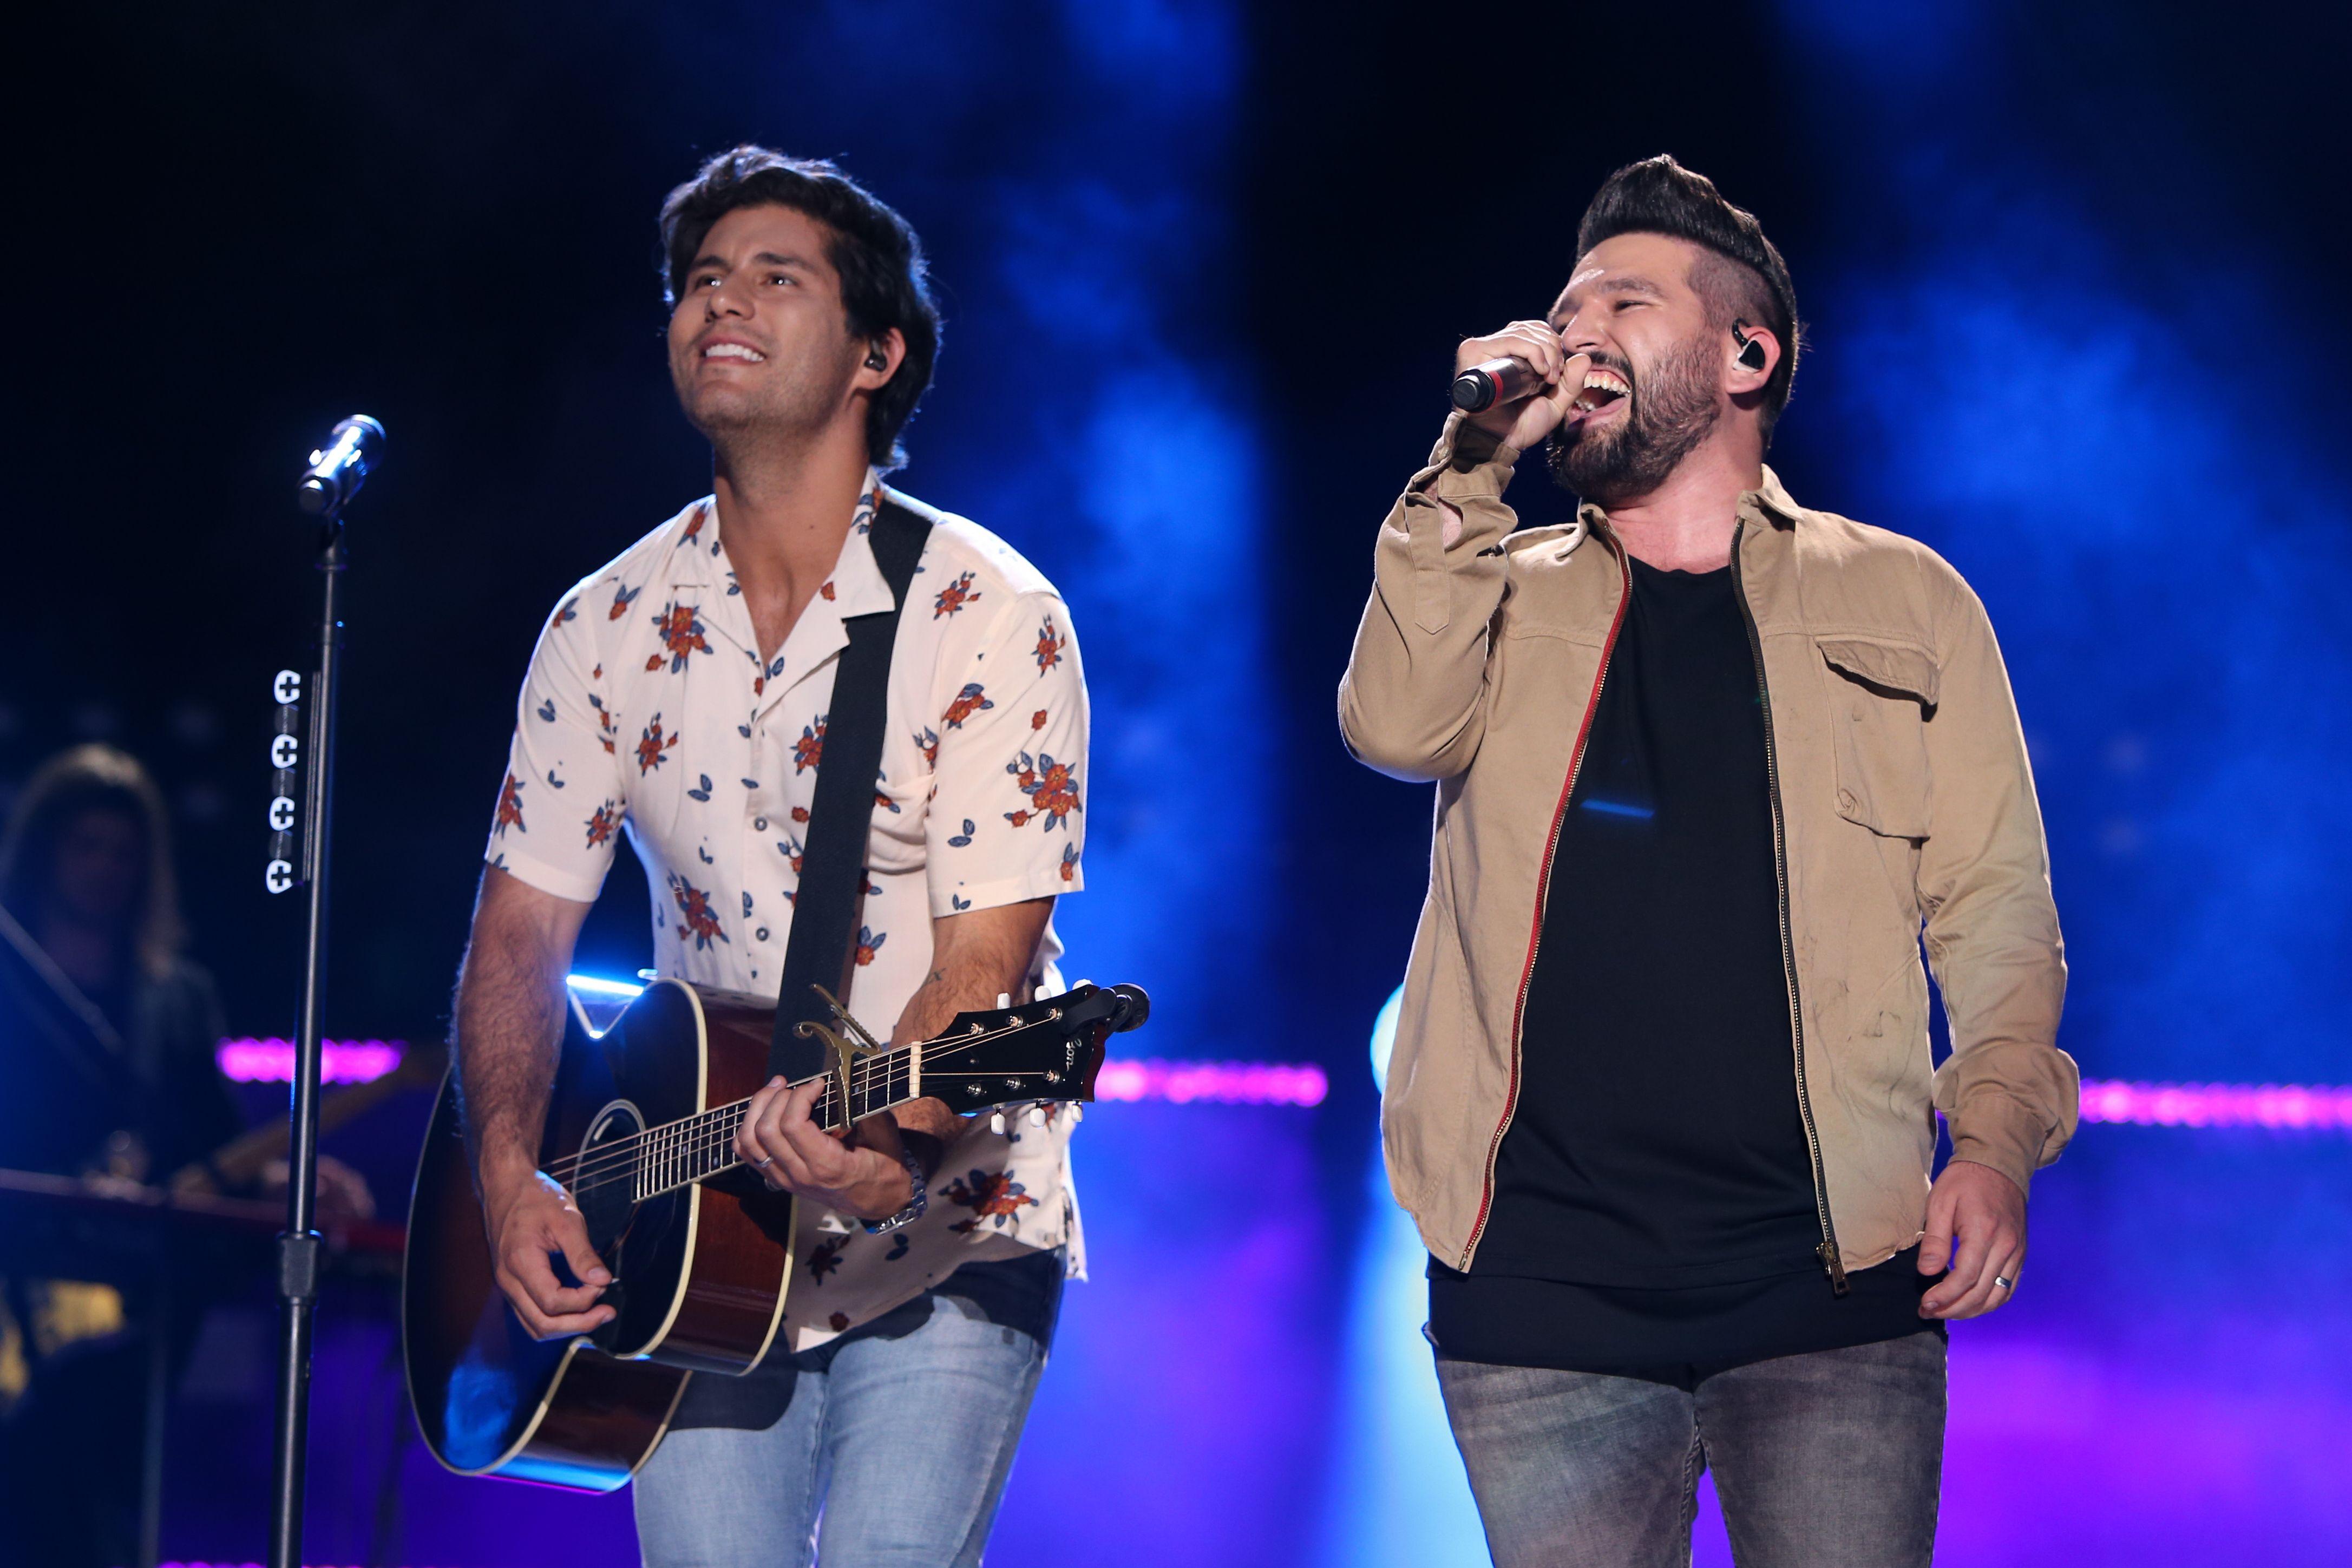 Hear Dan and Shay, Kelly Clarkson's Duet 'Keeping Score